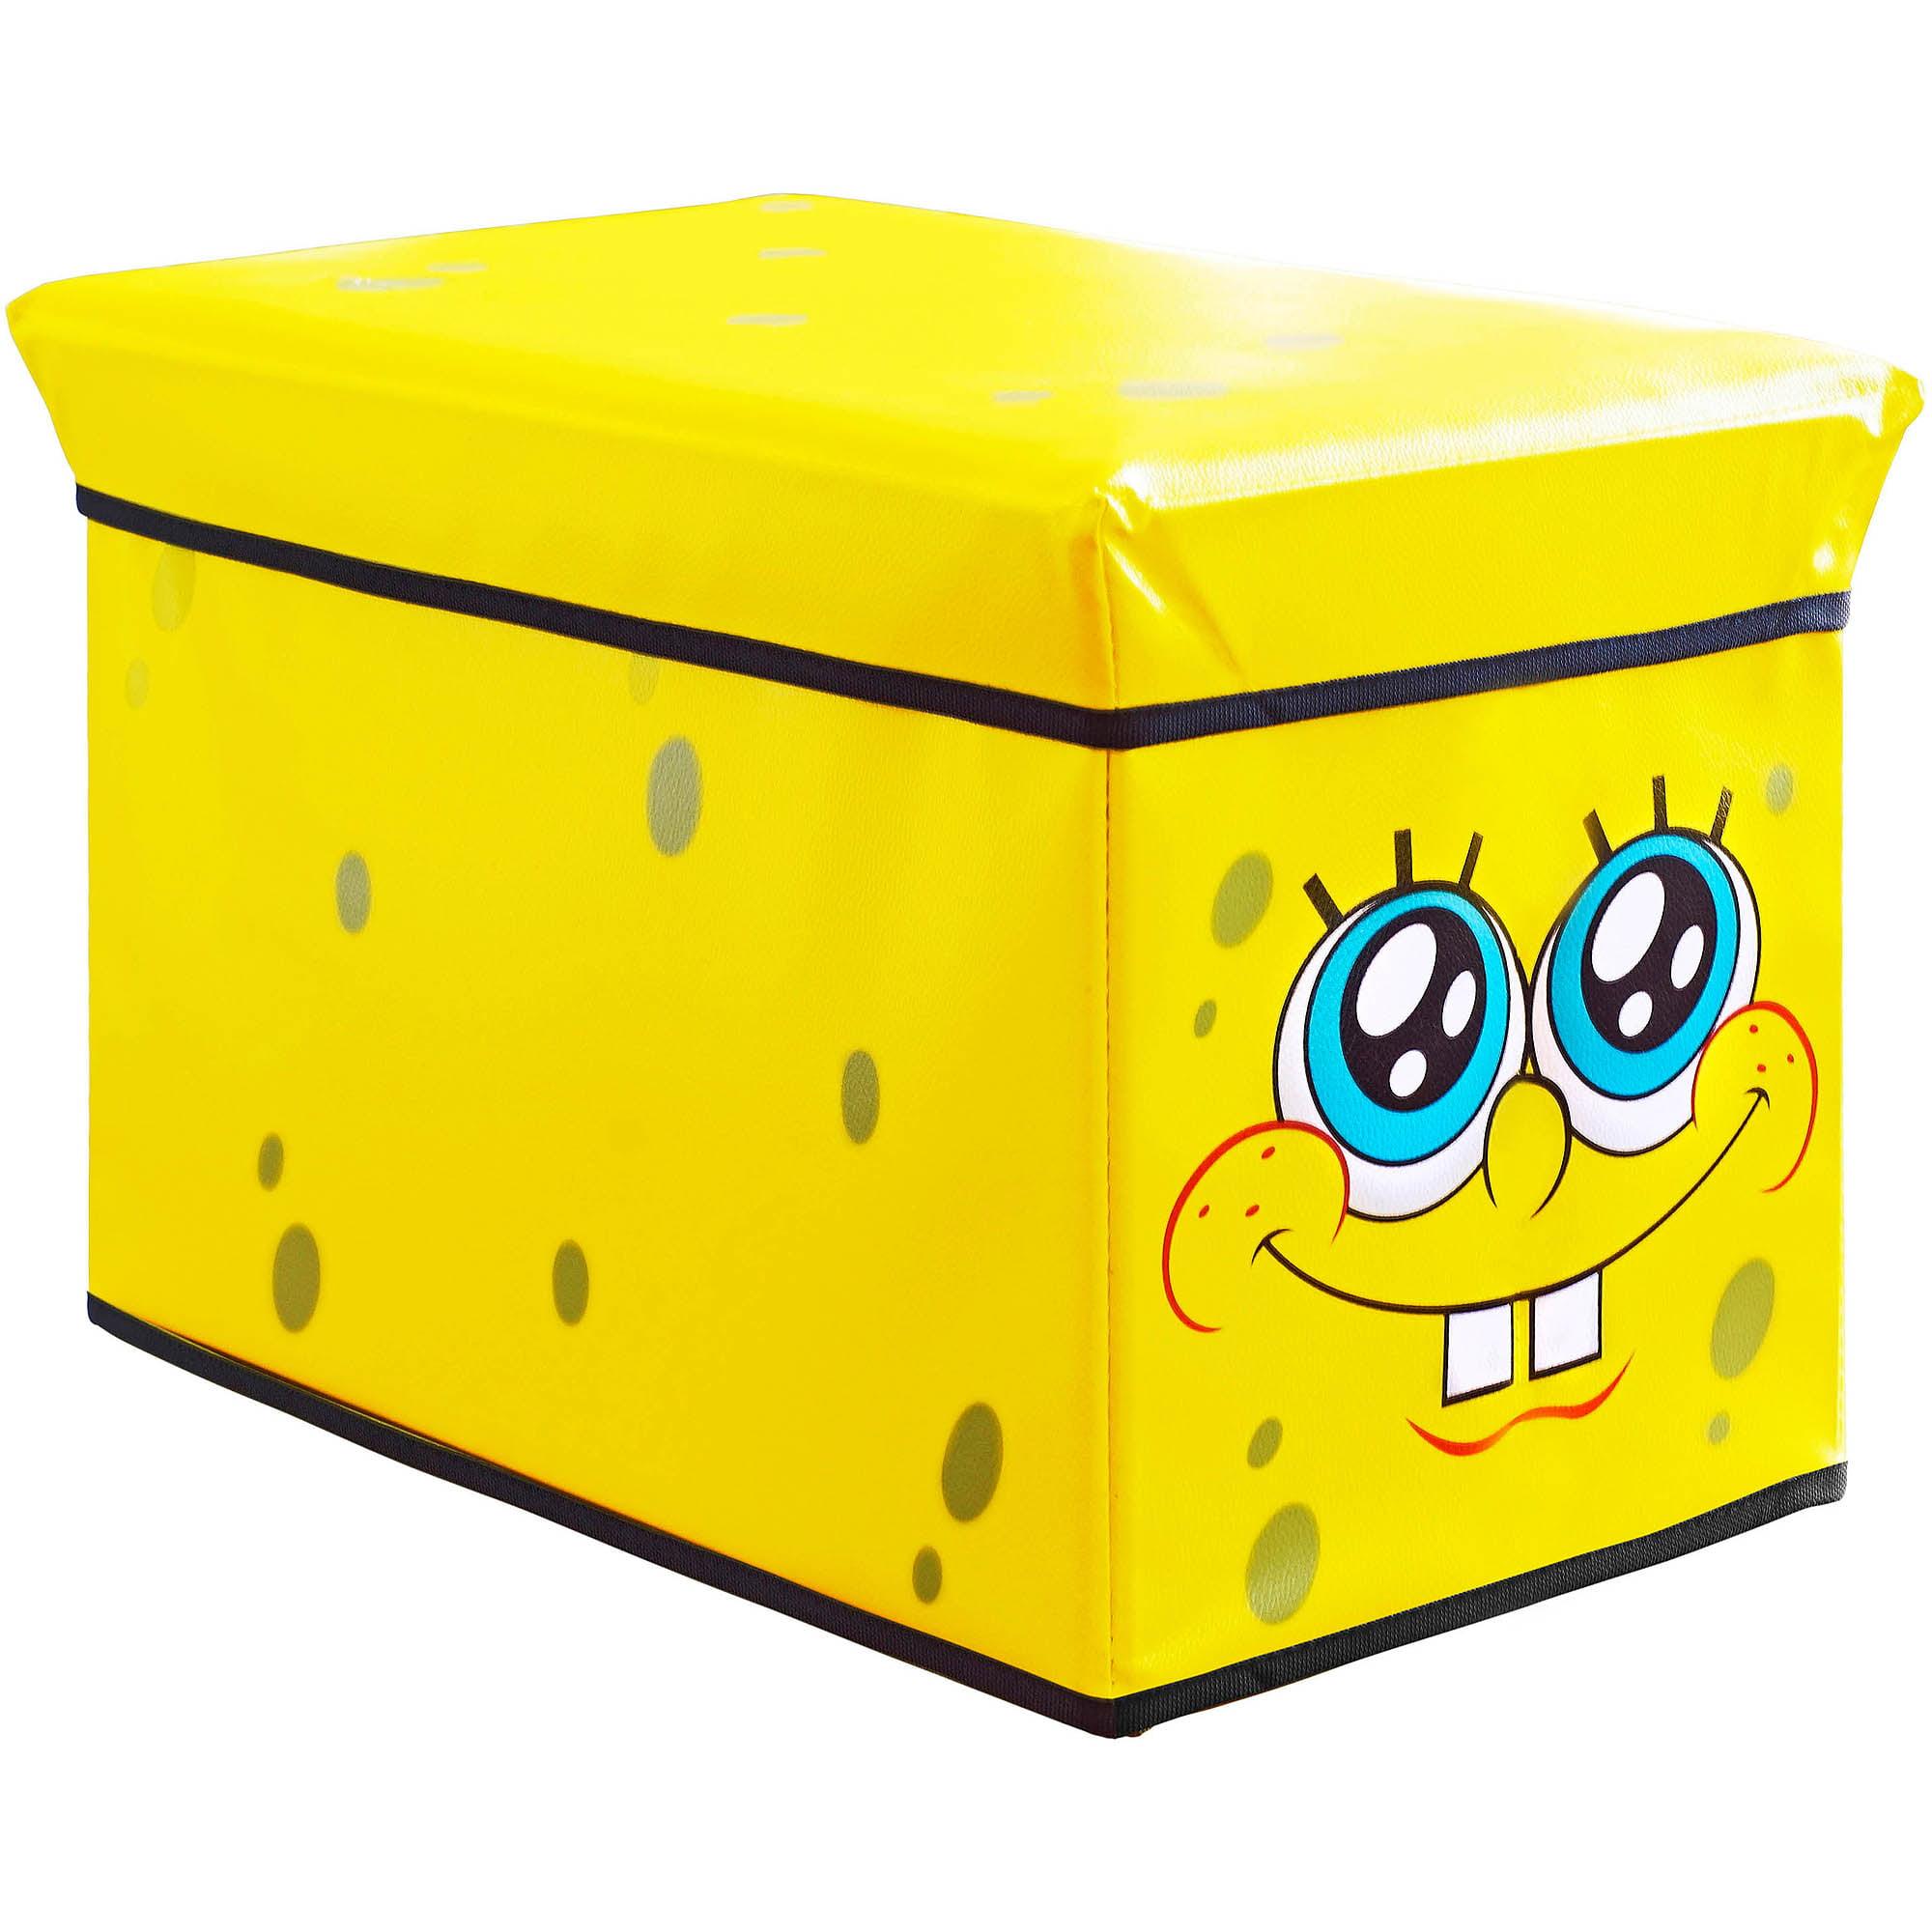 SpongeBob SquarePants Kidsu0027 Storage Ottoman   Walmart.com